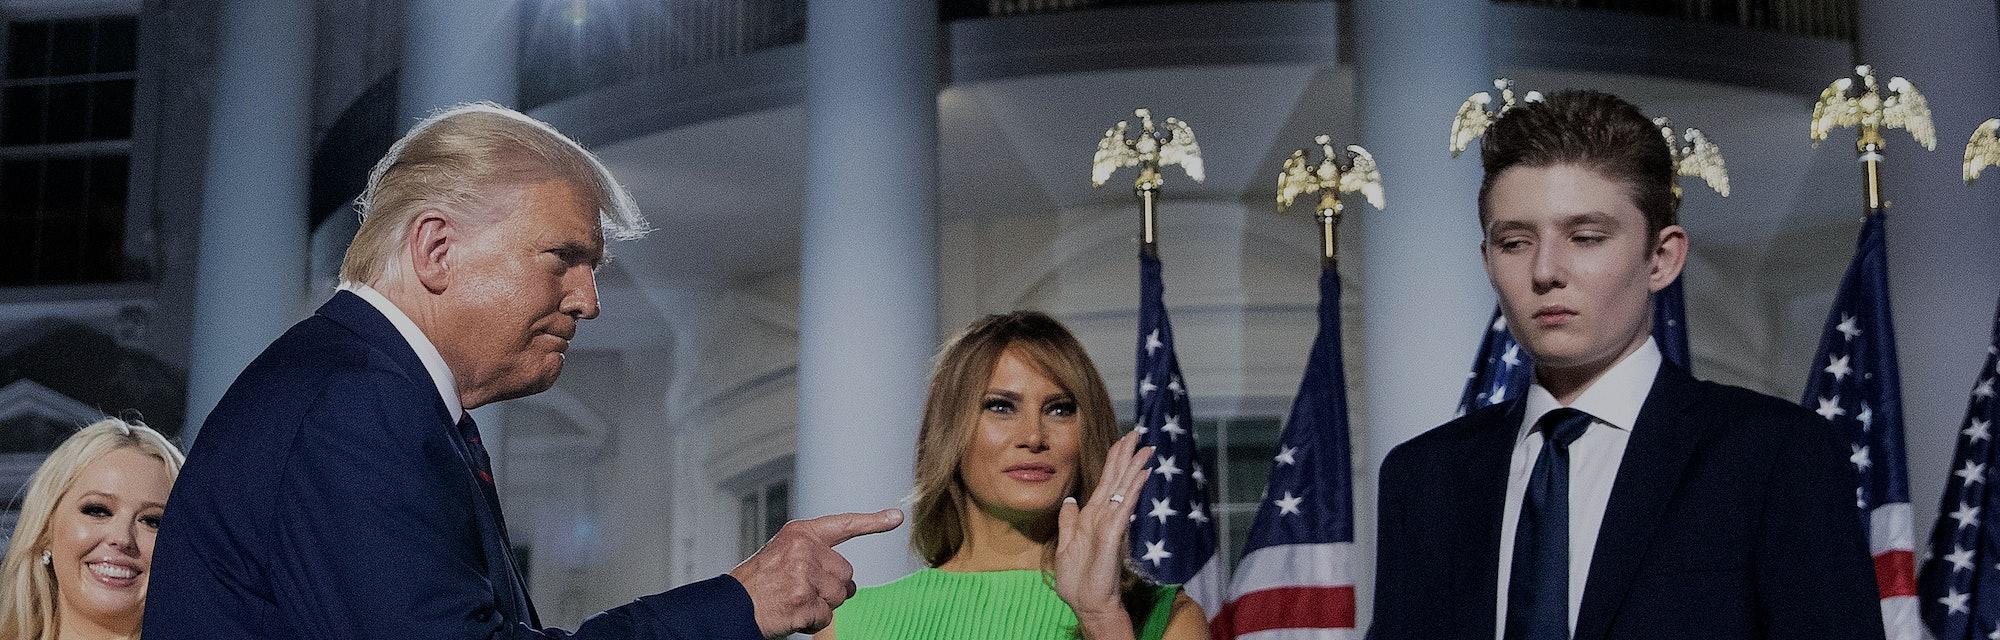 WASHINGTON, DC - AUGUST 27: U.S. President Donald Trump (L) gestures toward first lady Melania Trump...